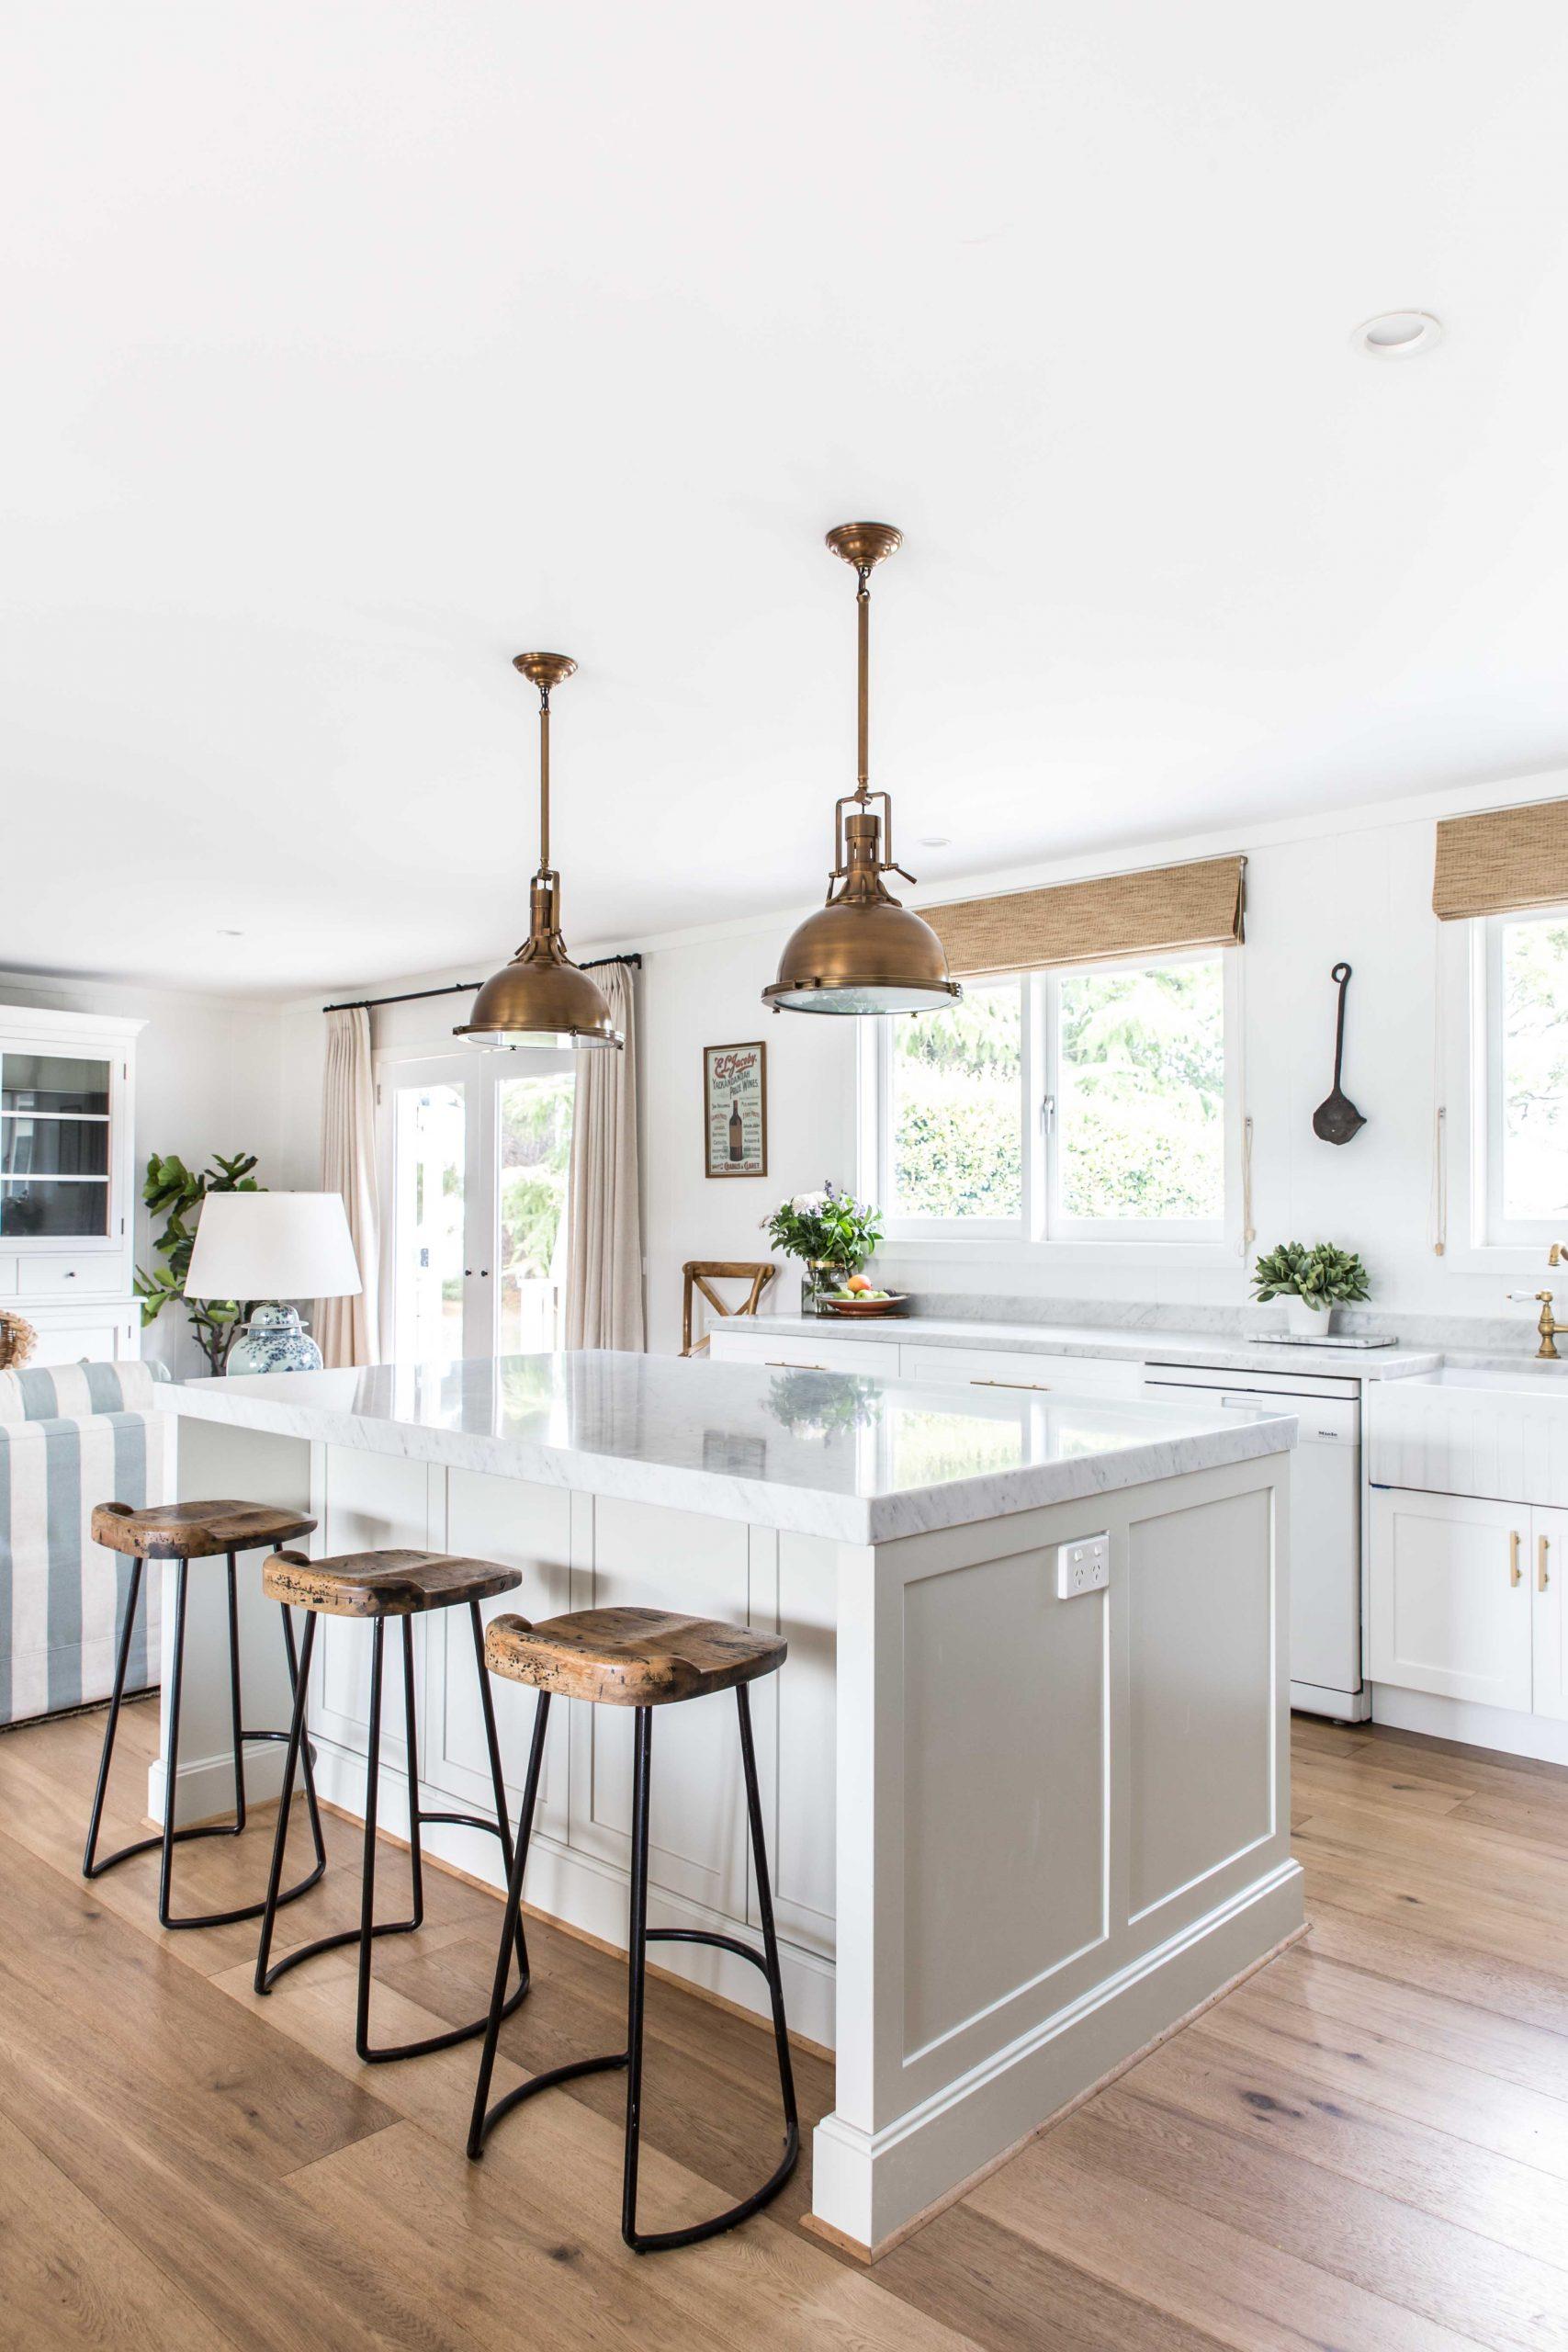 How To Create A Modern Farmhouse Kitchen - Cottonwood & Co